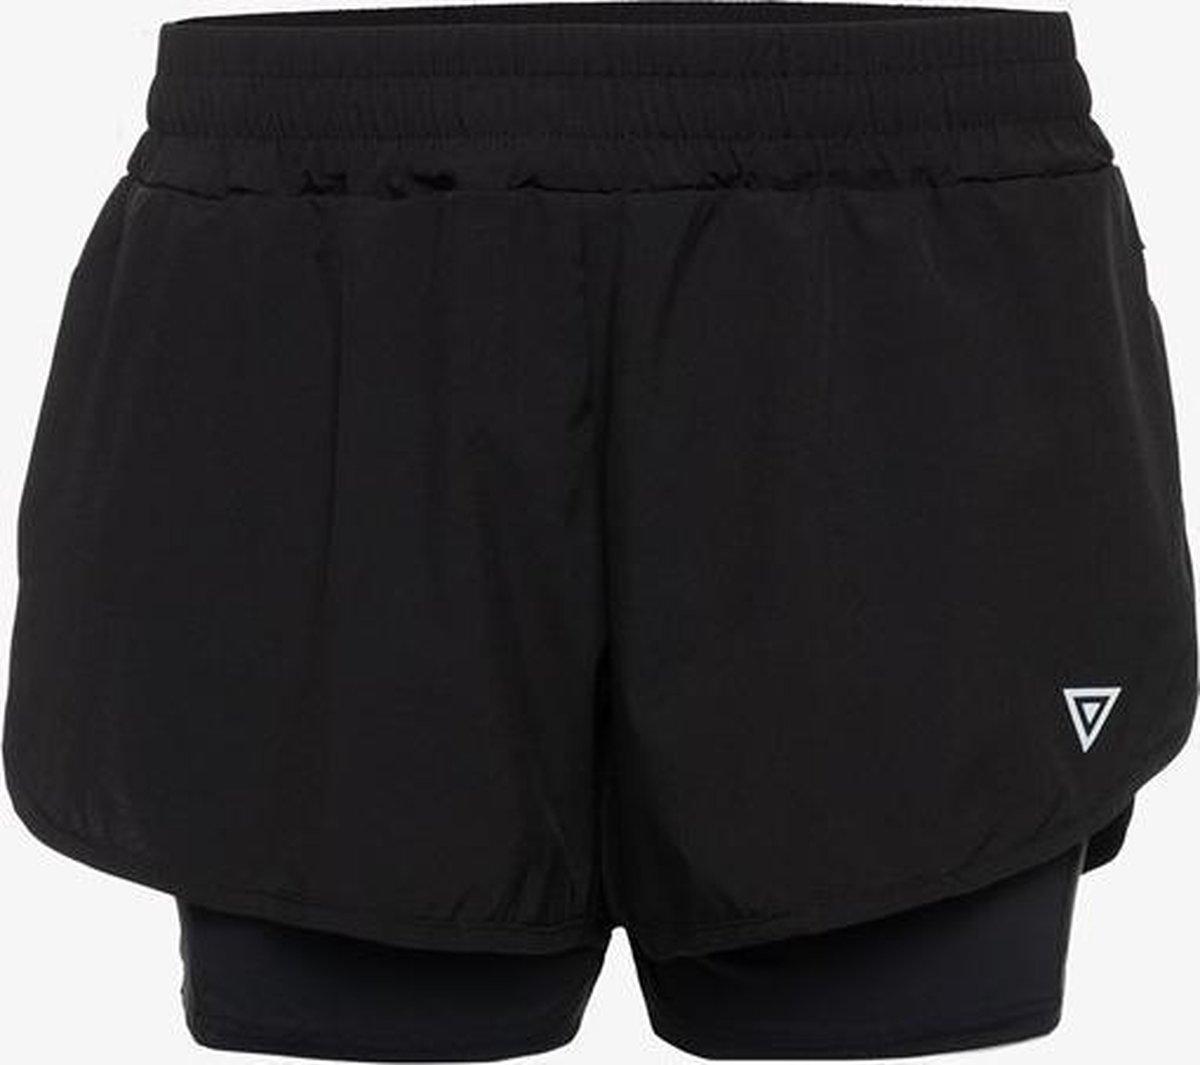 Osaga Pro dames hardloopshort - Zwart - Maat XL